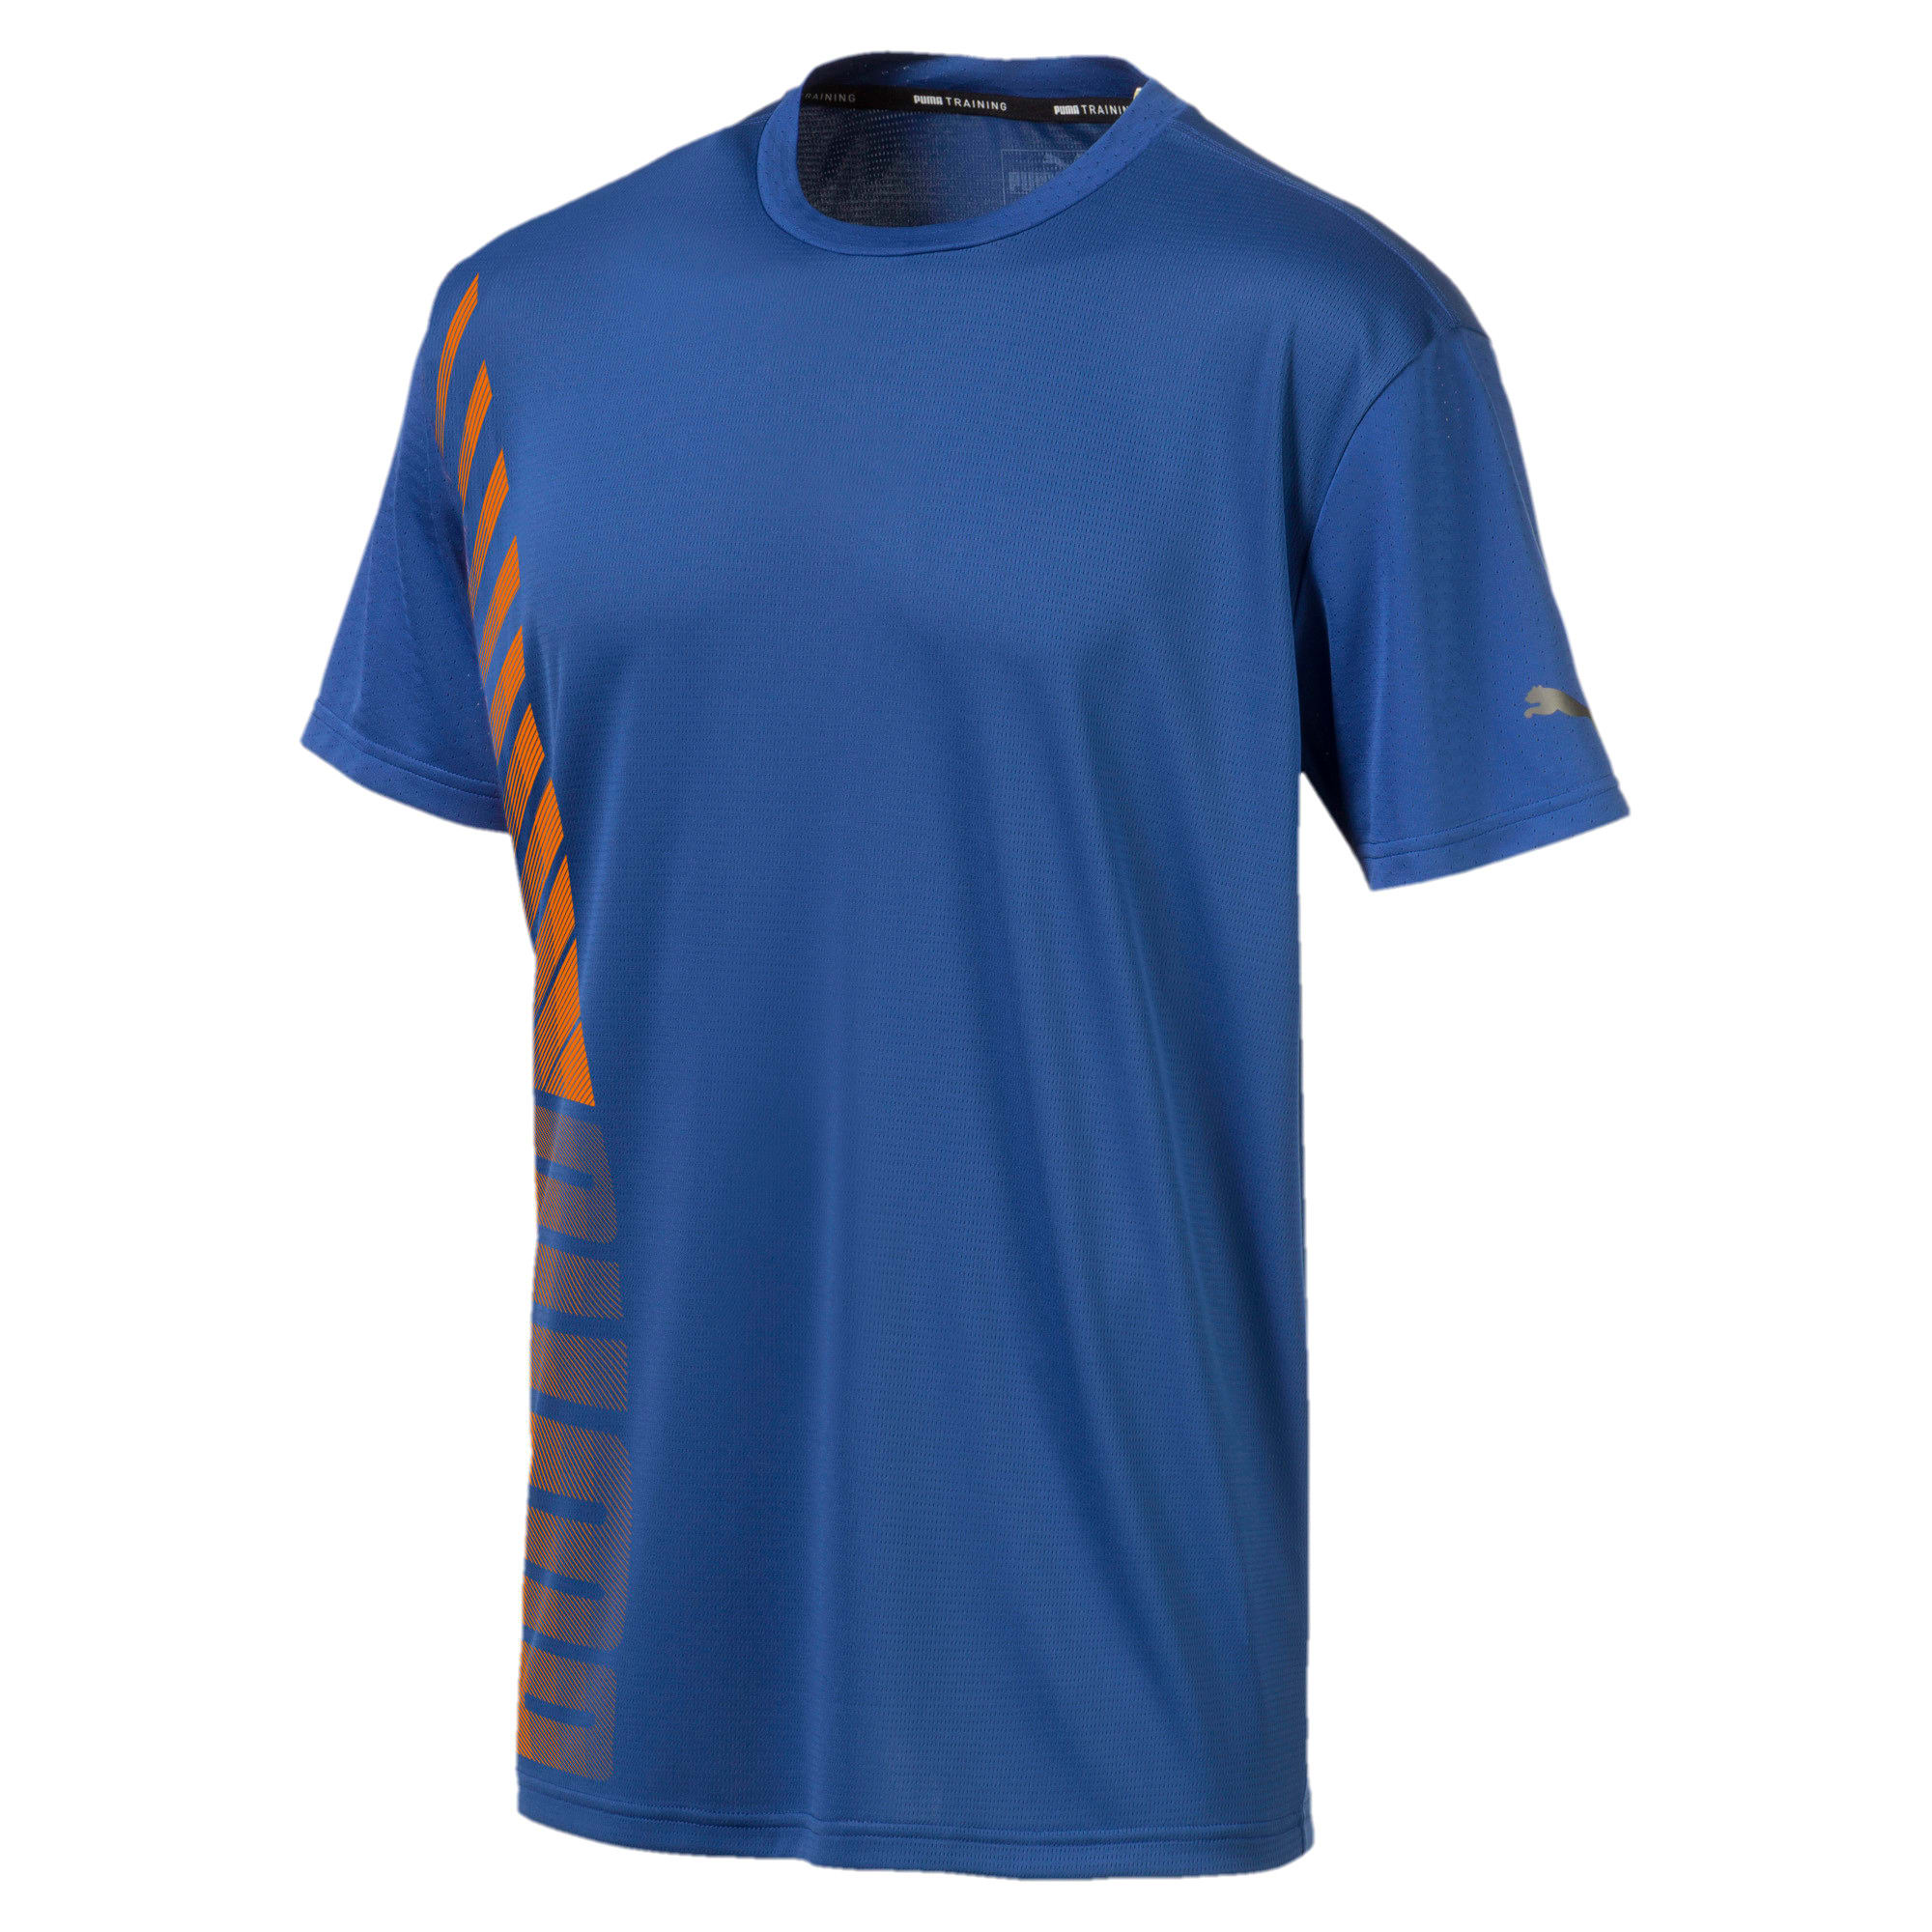 Thumbnail 4 of Collective Herren T-Shirt, Galaxy Blue, medium